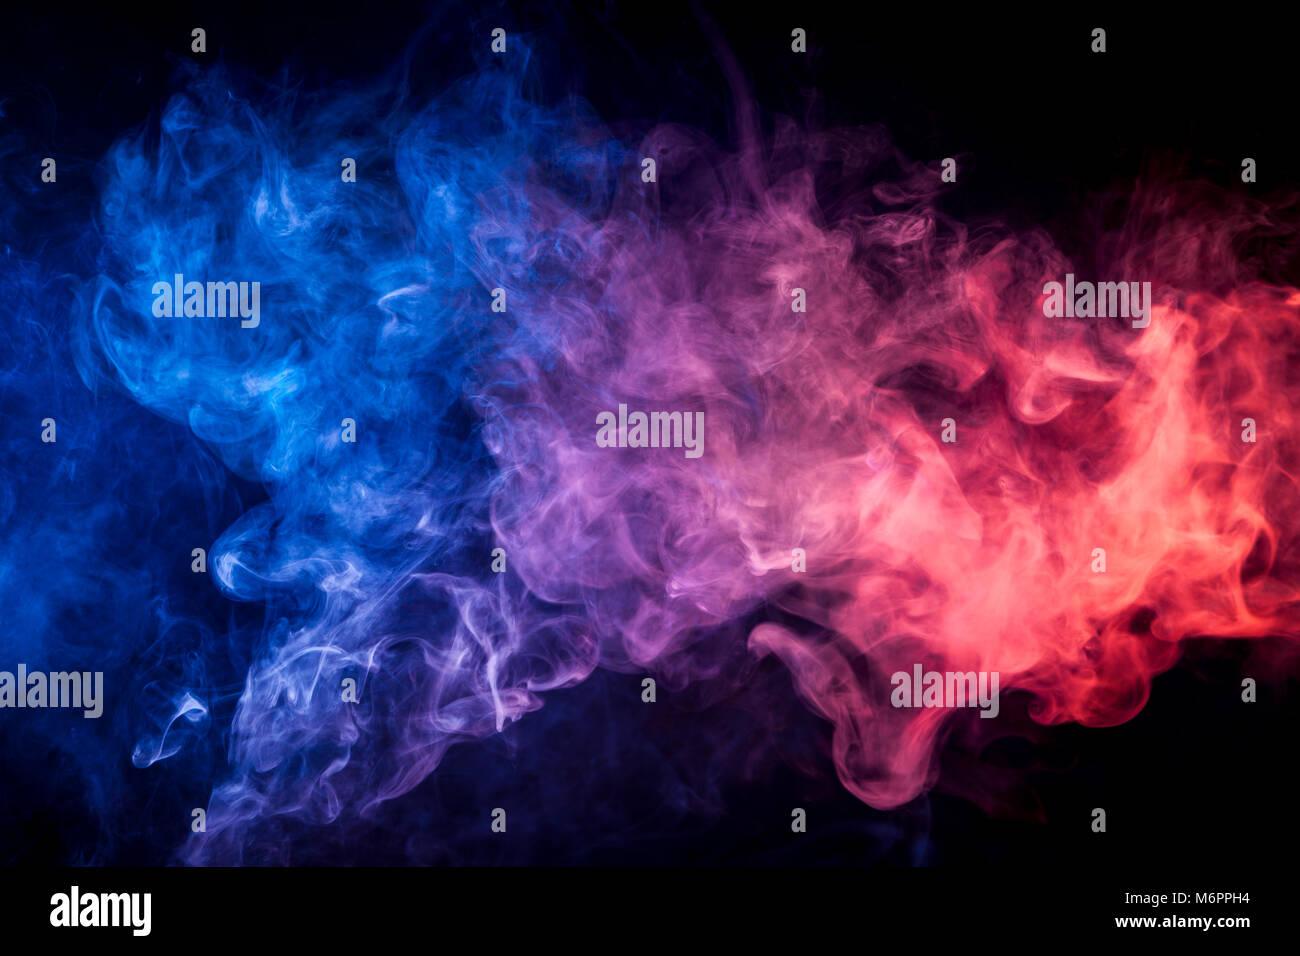 Espeso Humo De Color Rojo Azul Sobre Negro De Fondo Aislados